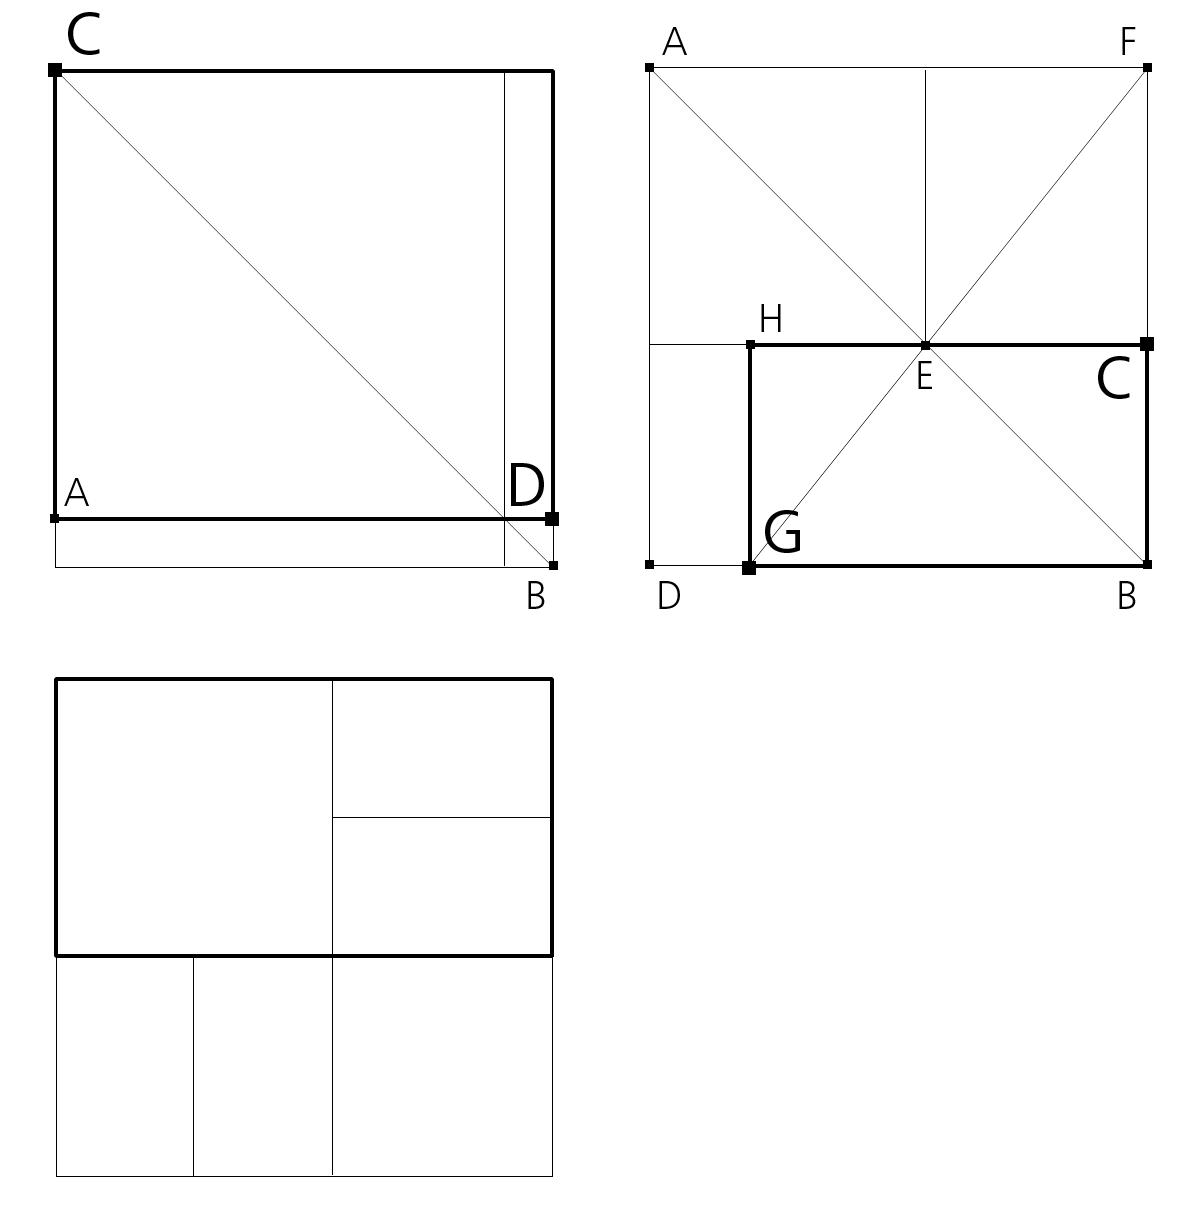 Komplement - Dynamische Symmetrie